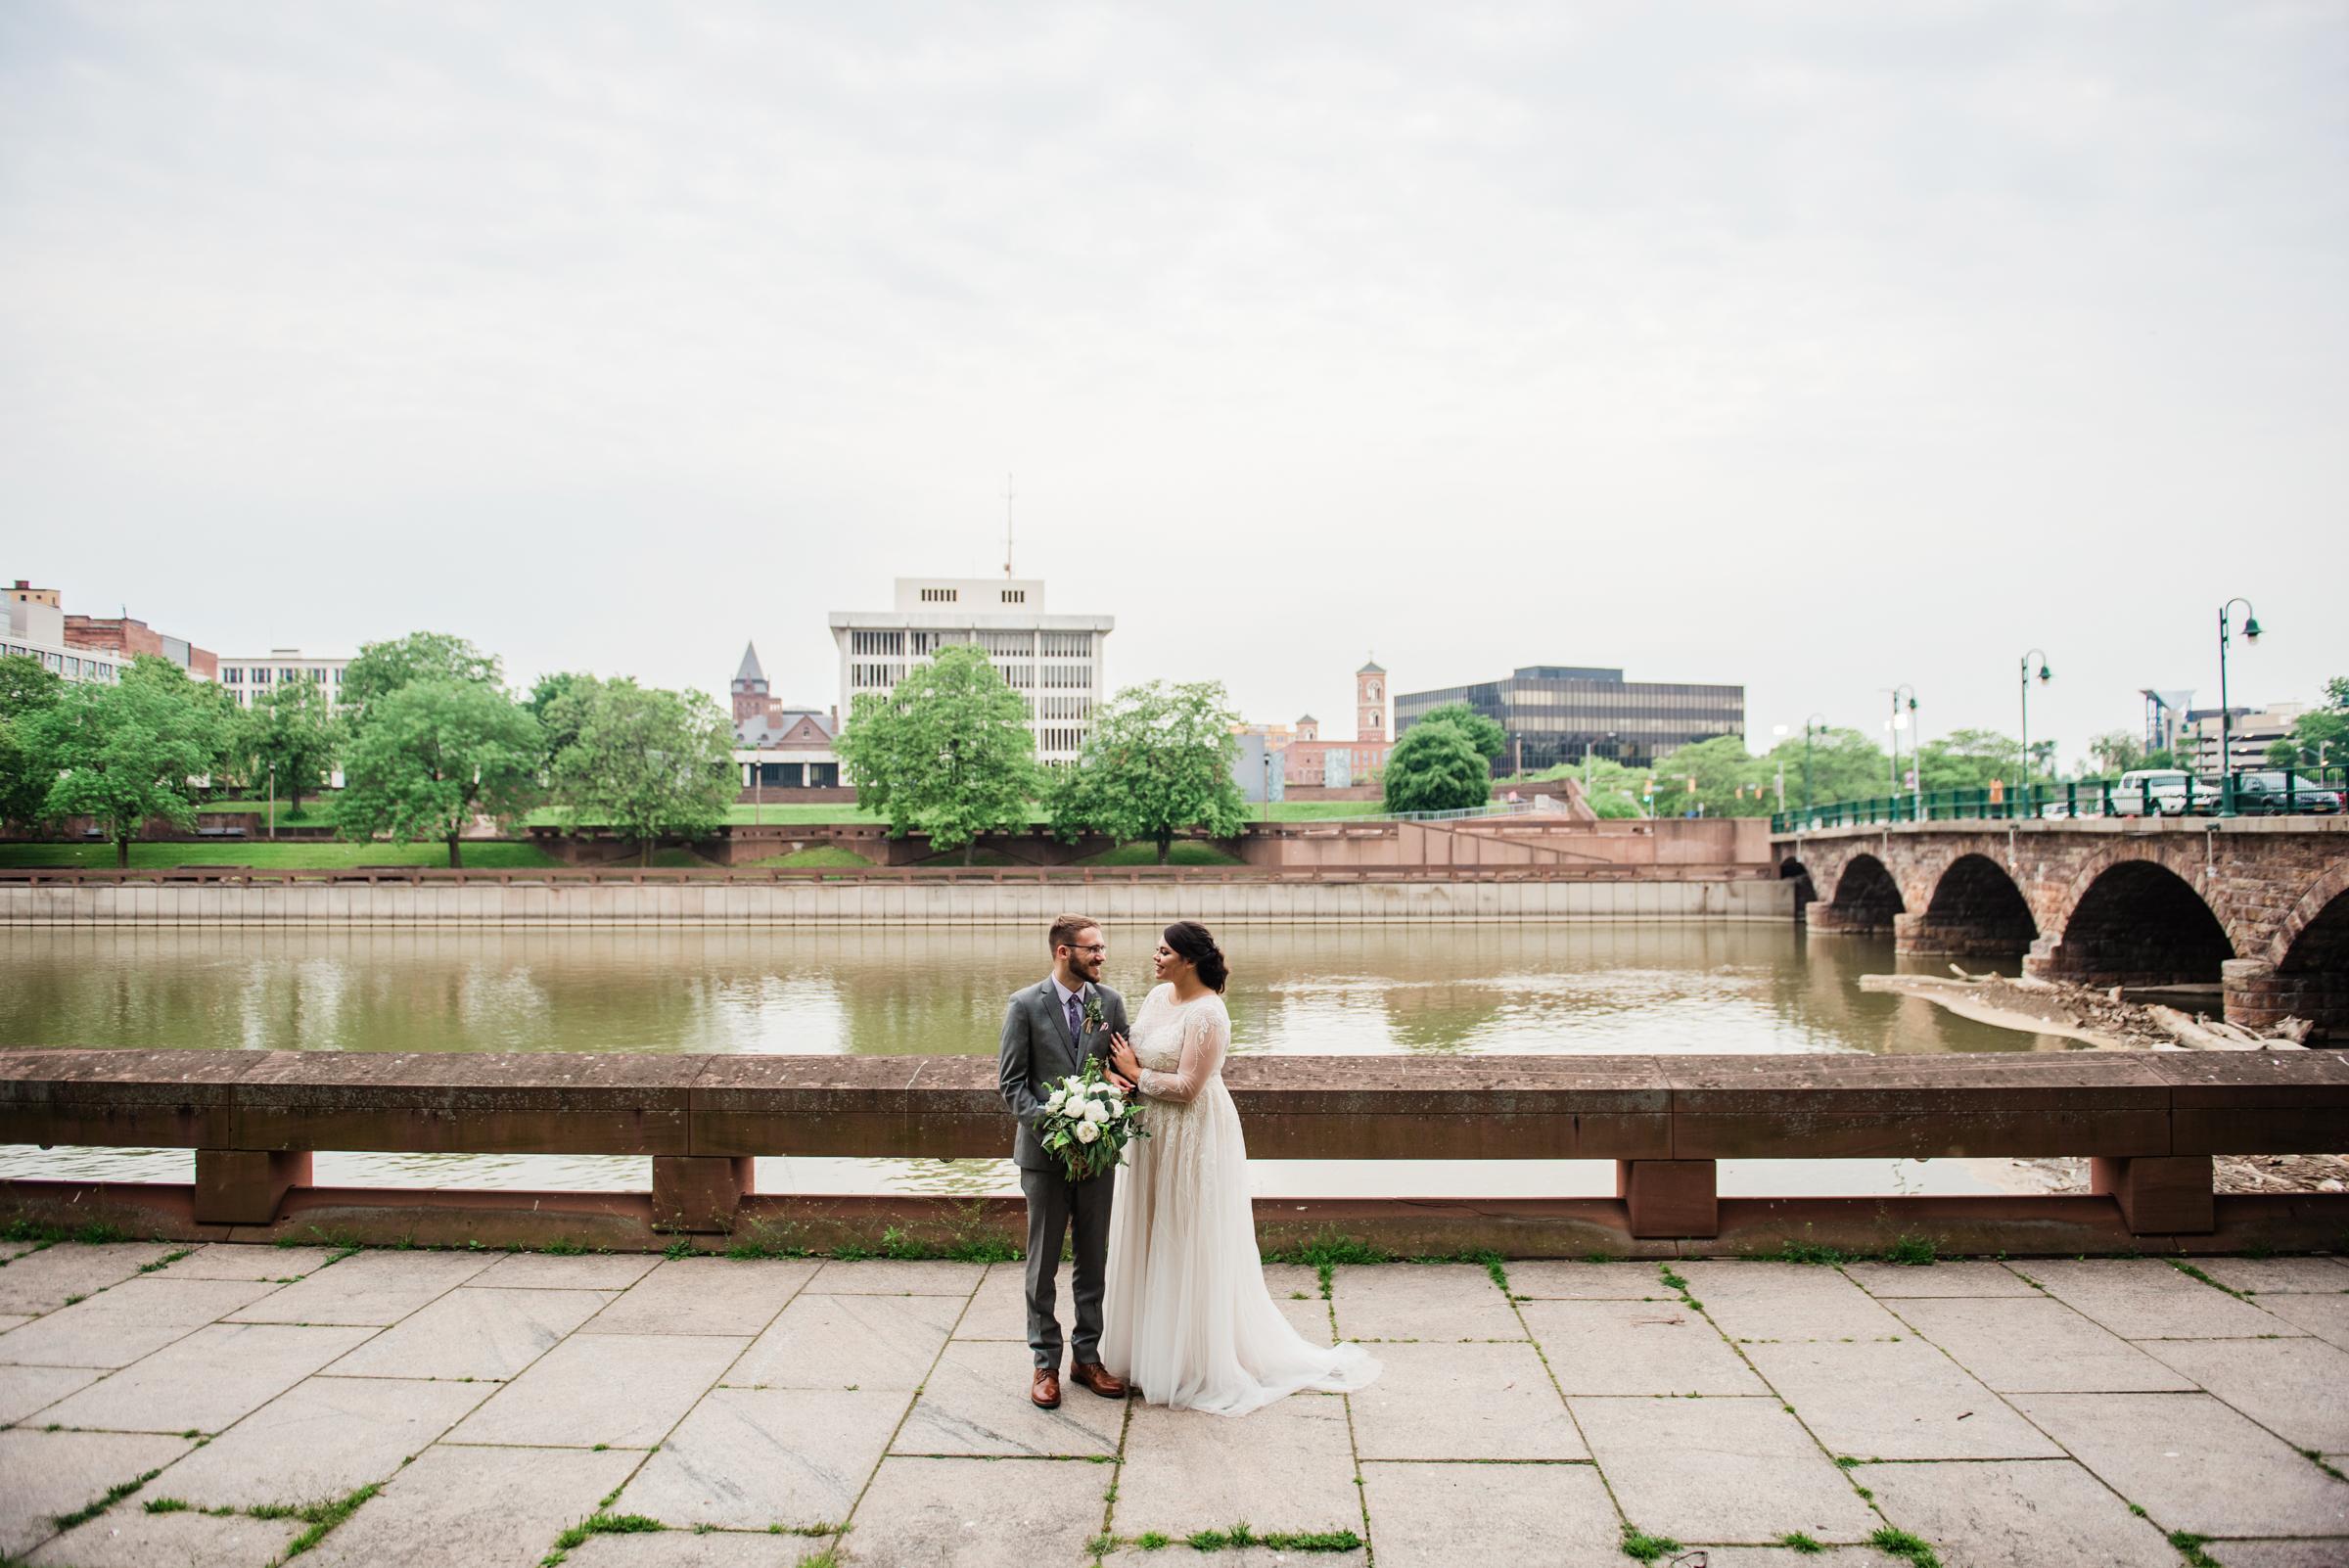 Studio_180_Lamberton_Conservatory_Rochester_Wedding_JILL_STUDIO_Rochester_NY_Photographer_DSC_9057.jpg